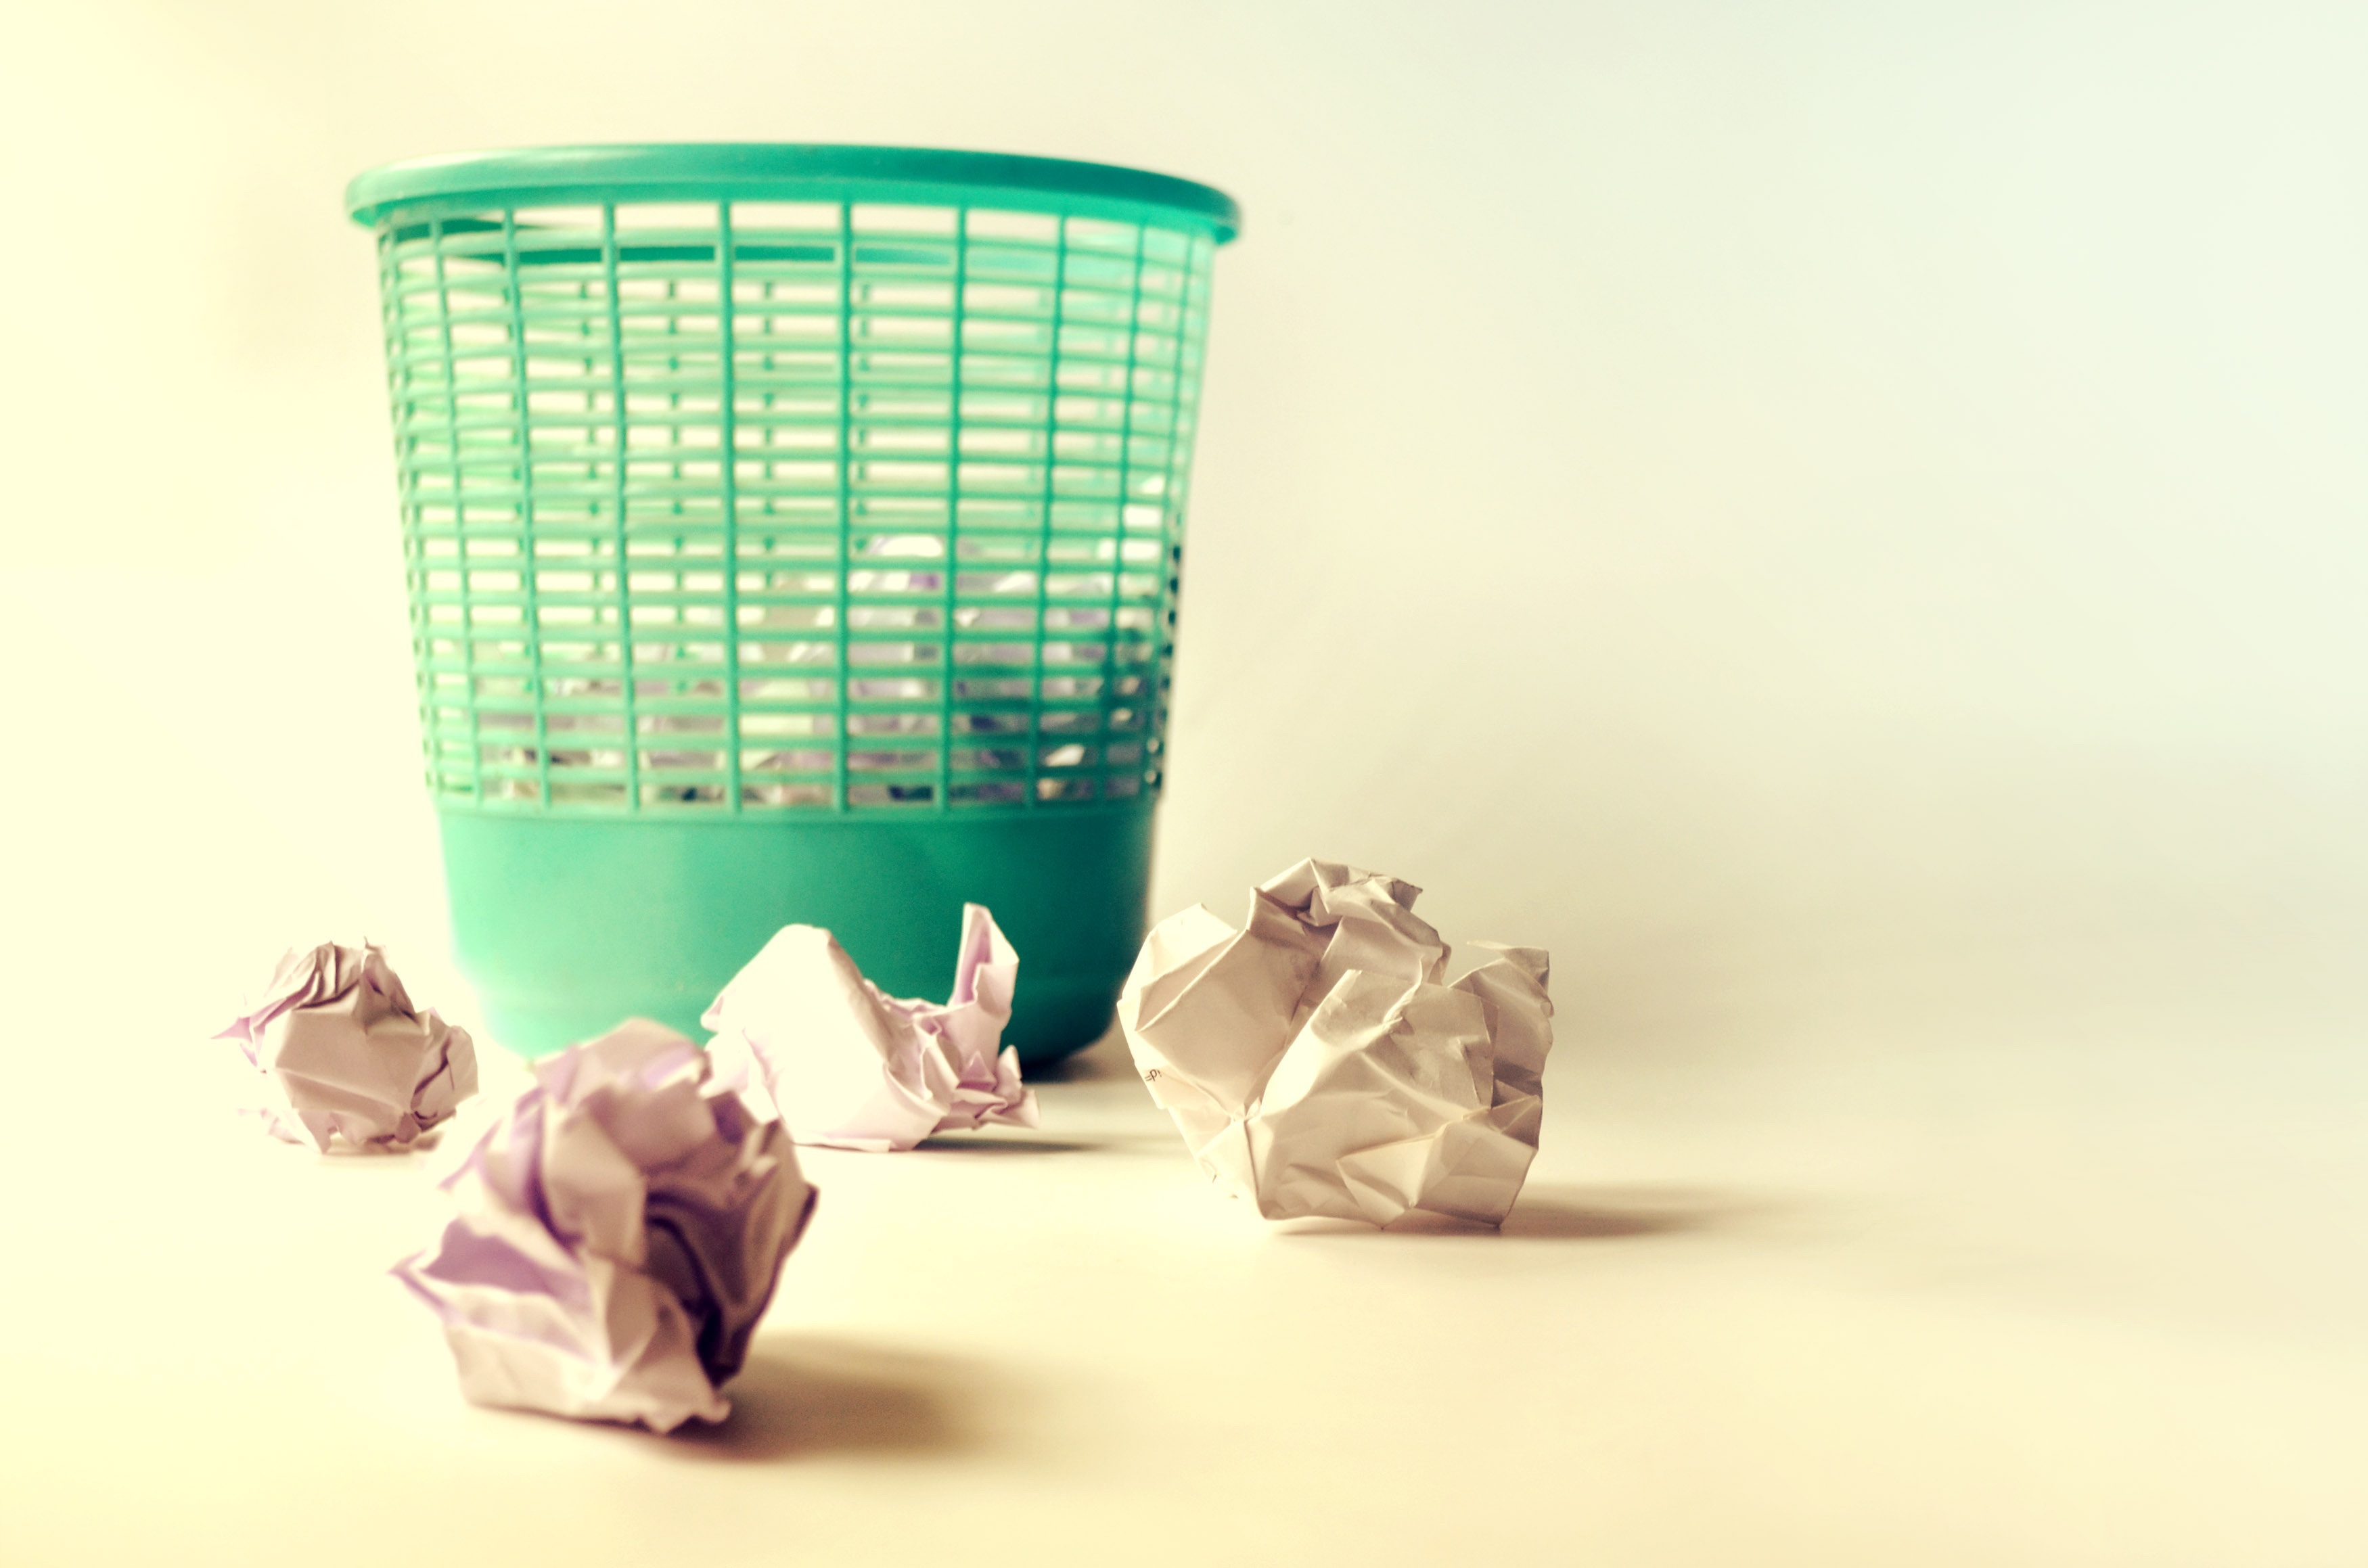 waste_paper_bin_hires